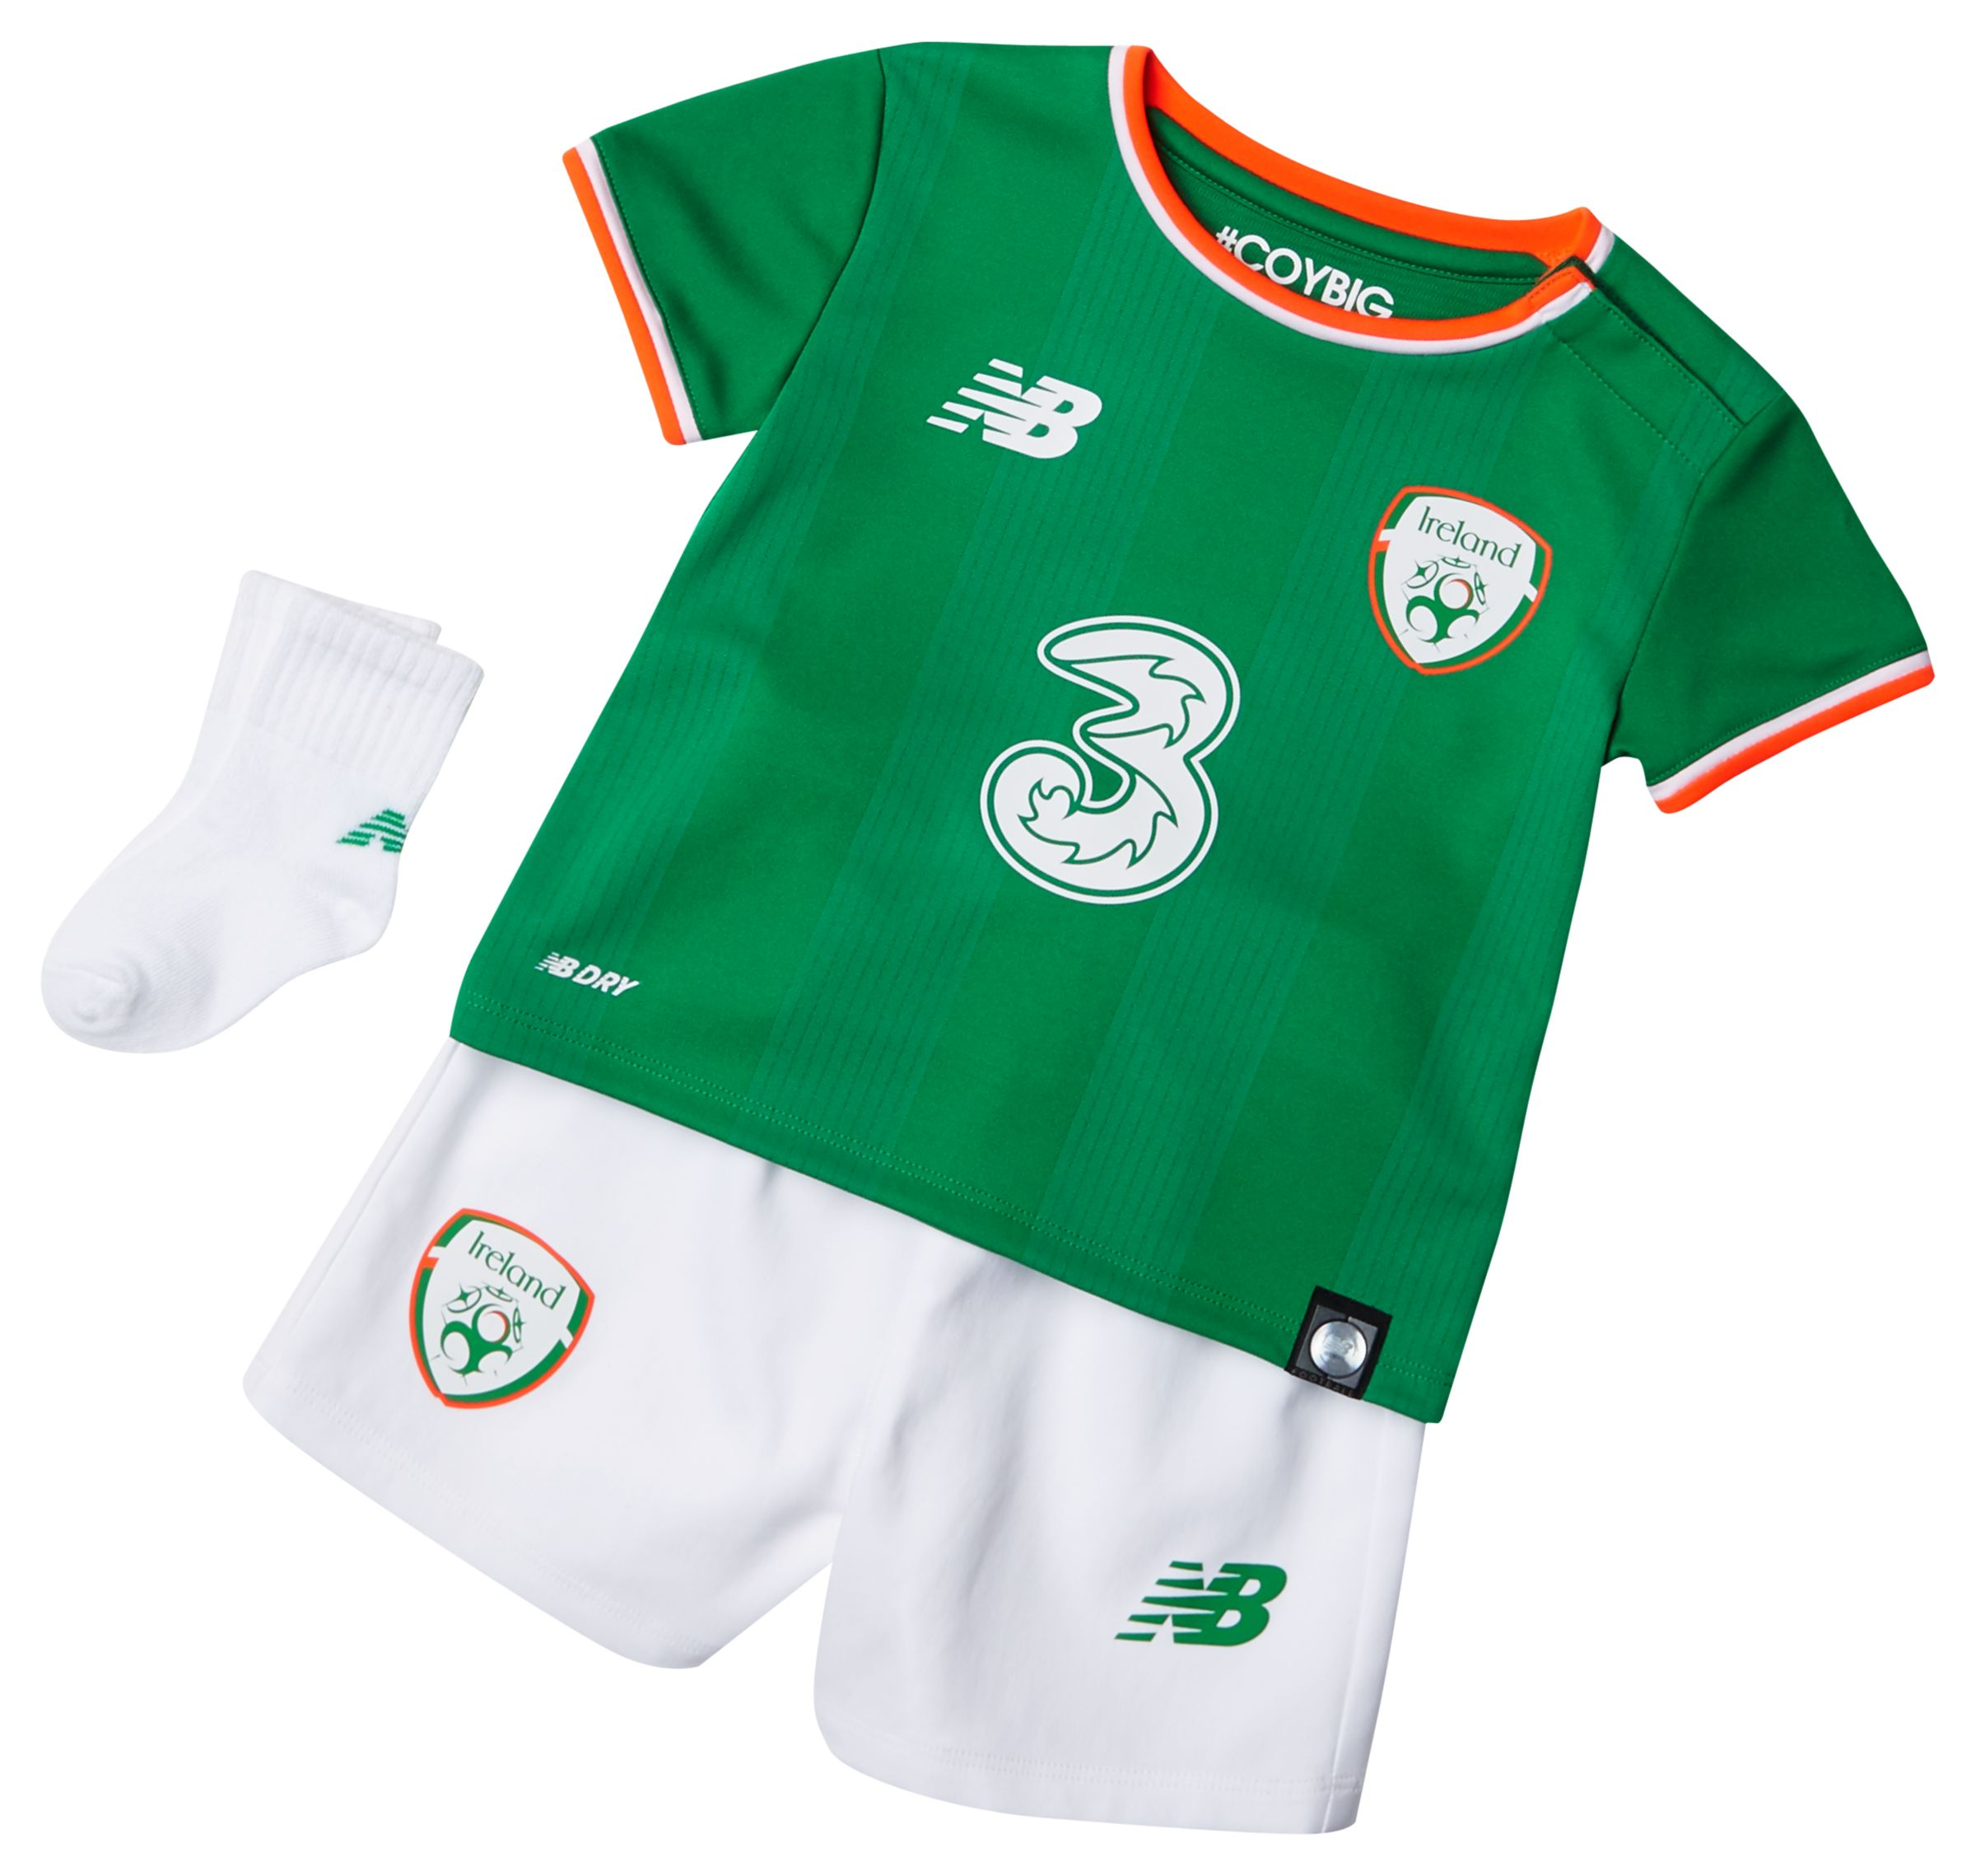 NB FAI Home Baby Kit - Set, Jolly Green